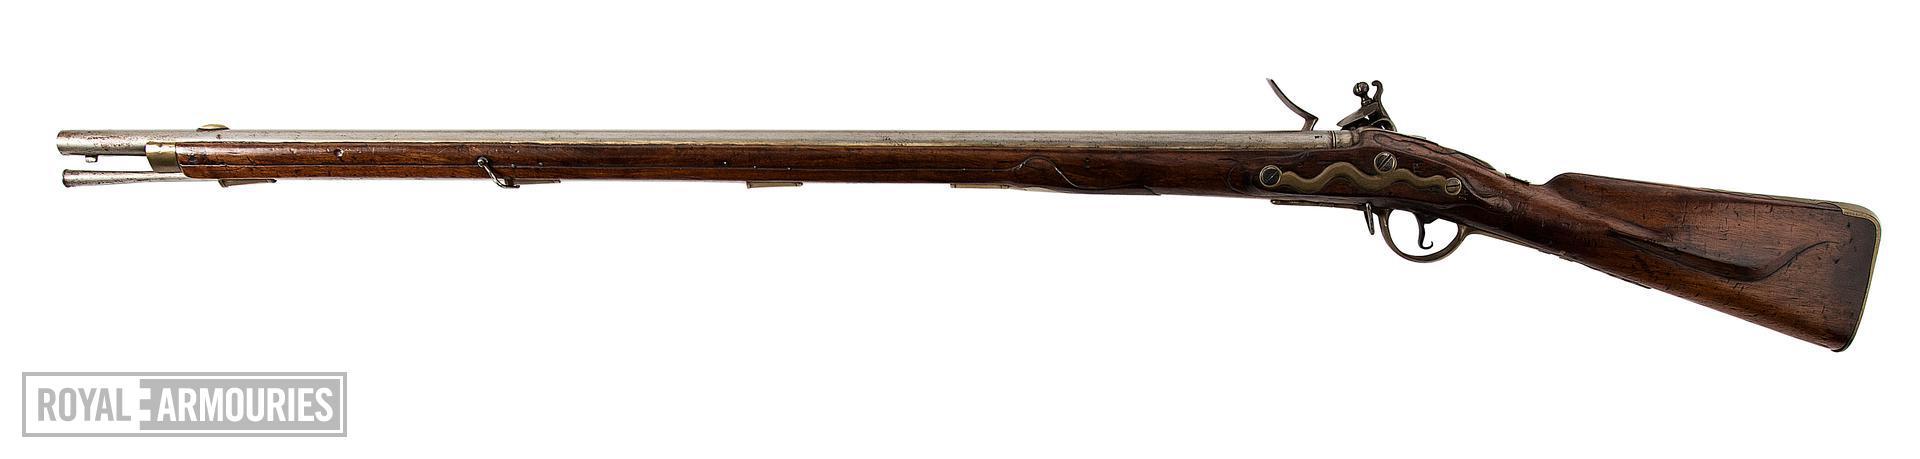 Flintlock muzzle-loading military rifle-musket - Fusillier Model 1787 (Modified in 1796) Flintlock muzzle-loading military rifle-musket, Fusillier Model 1787 (Modified in 1796), about 1790.